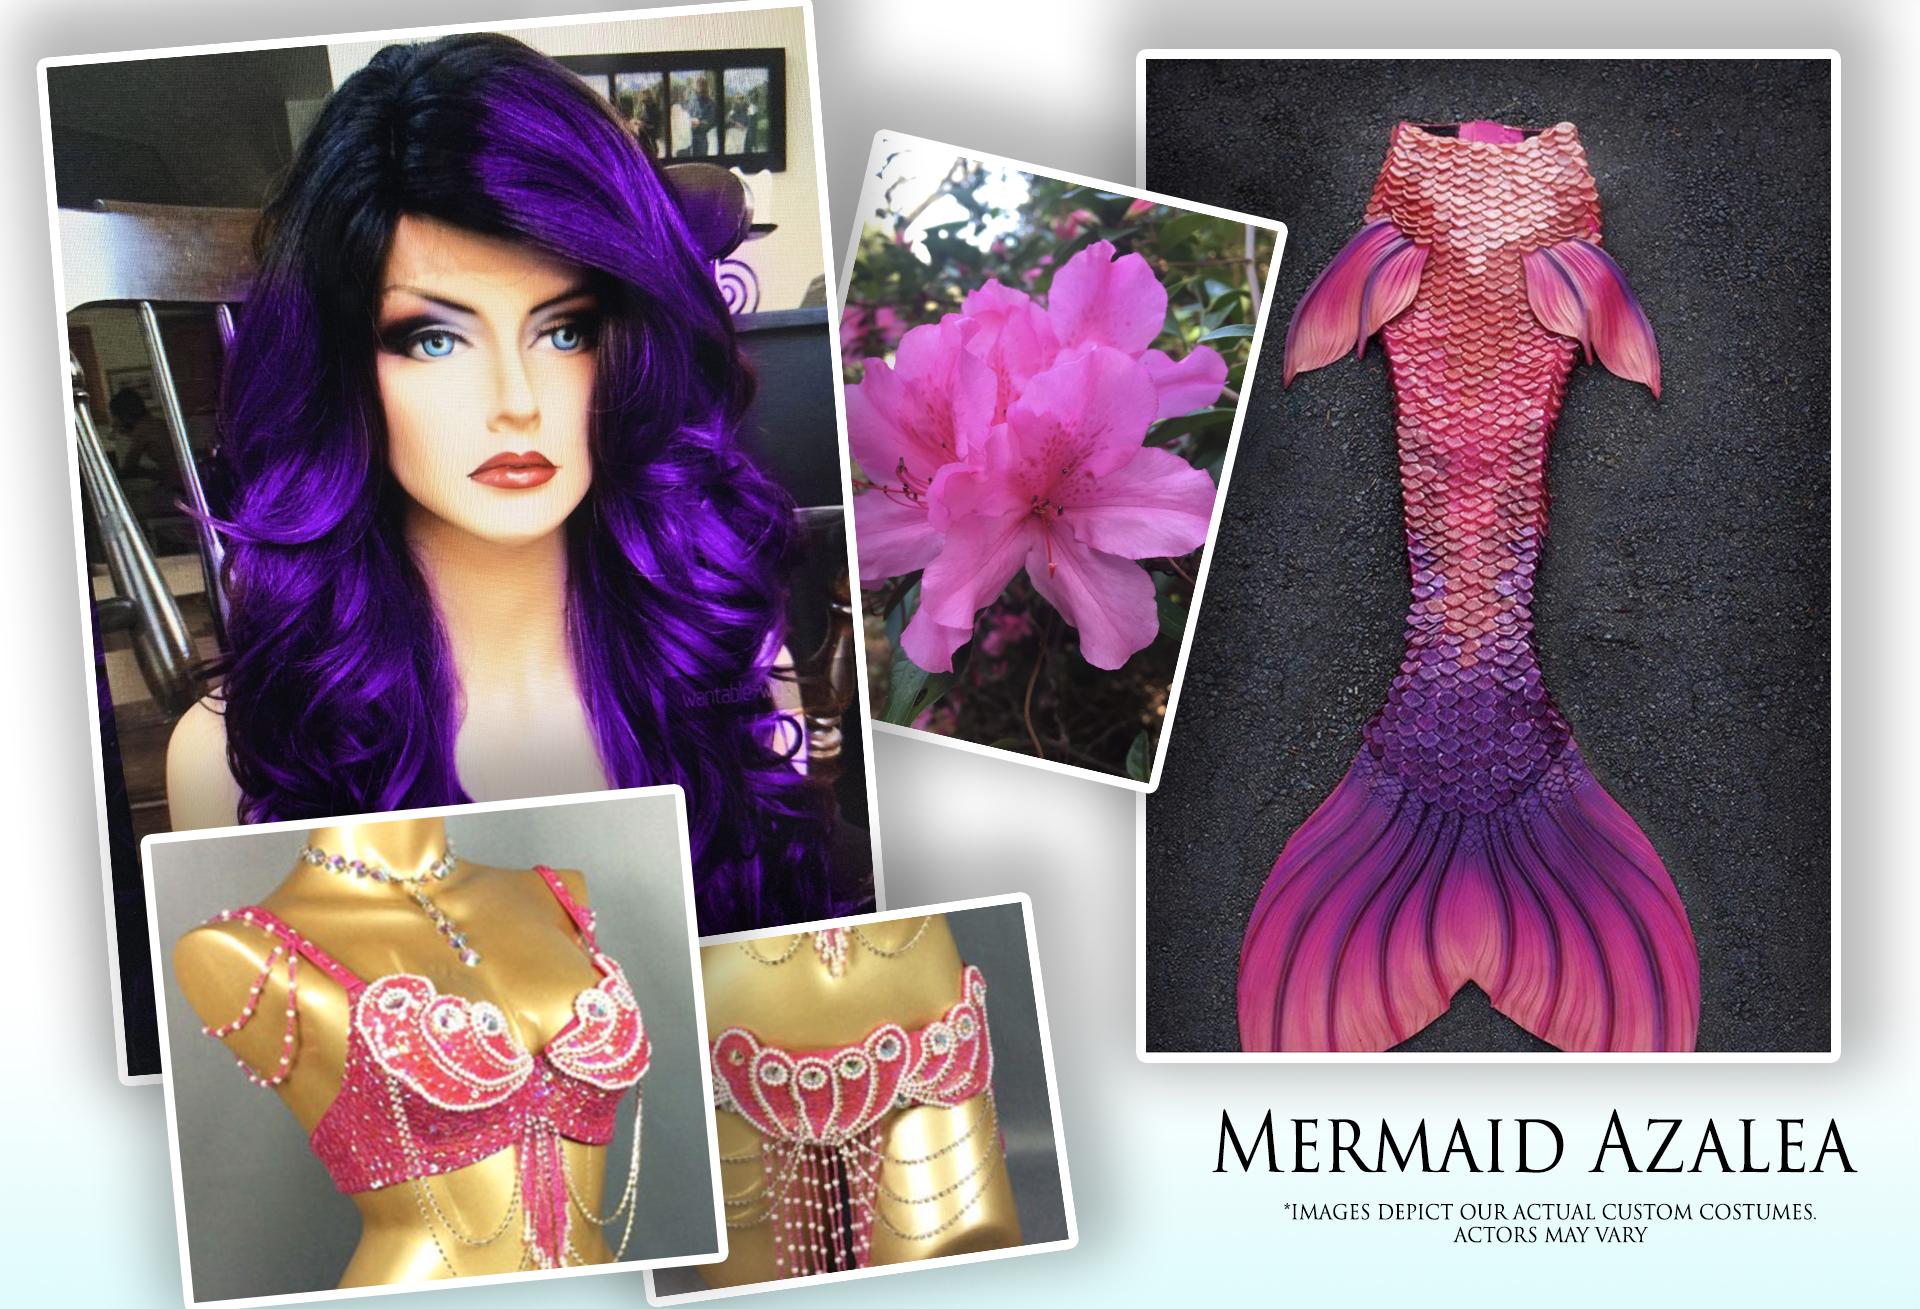 Mermaid Azalea